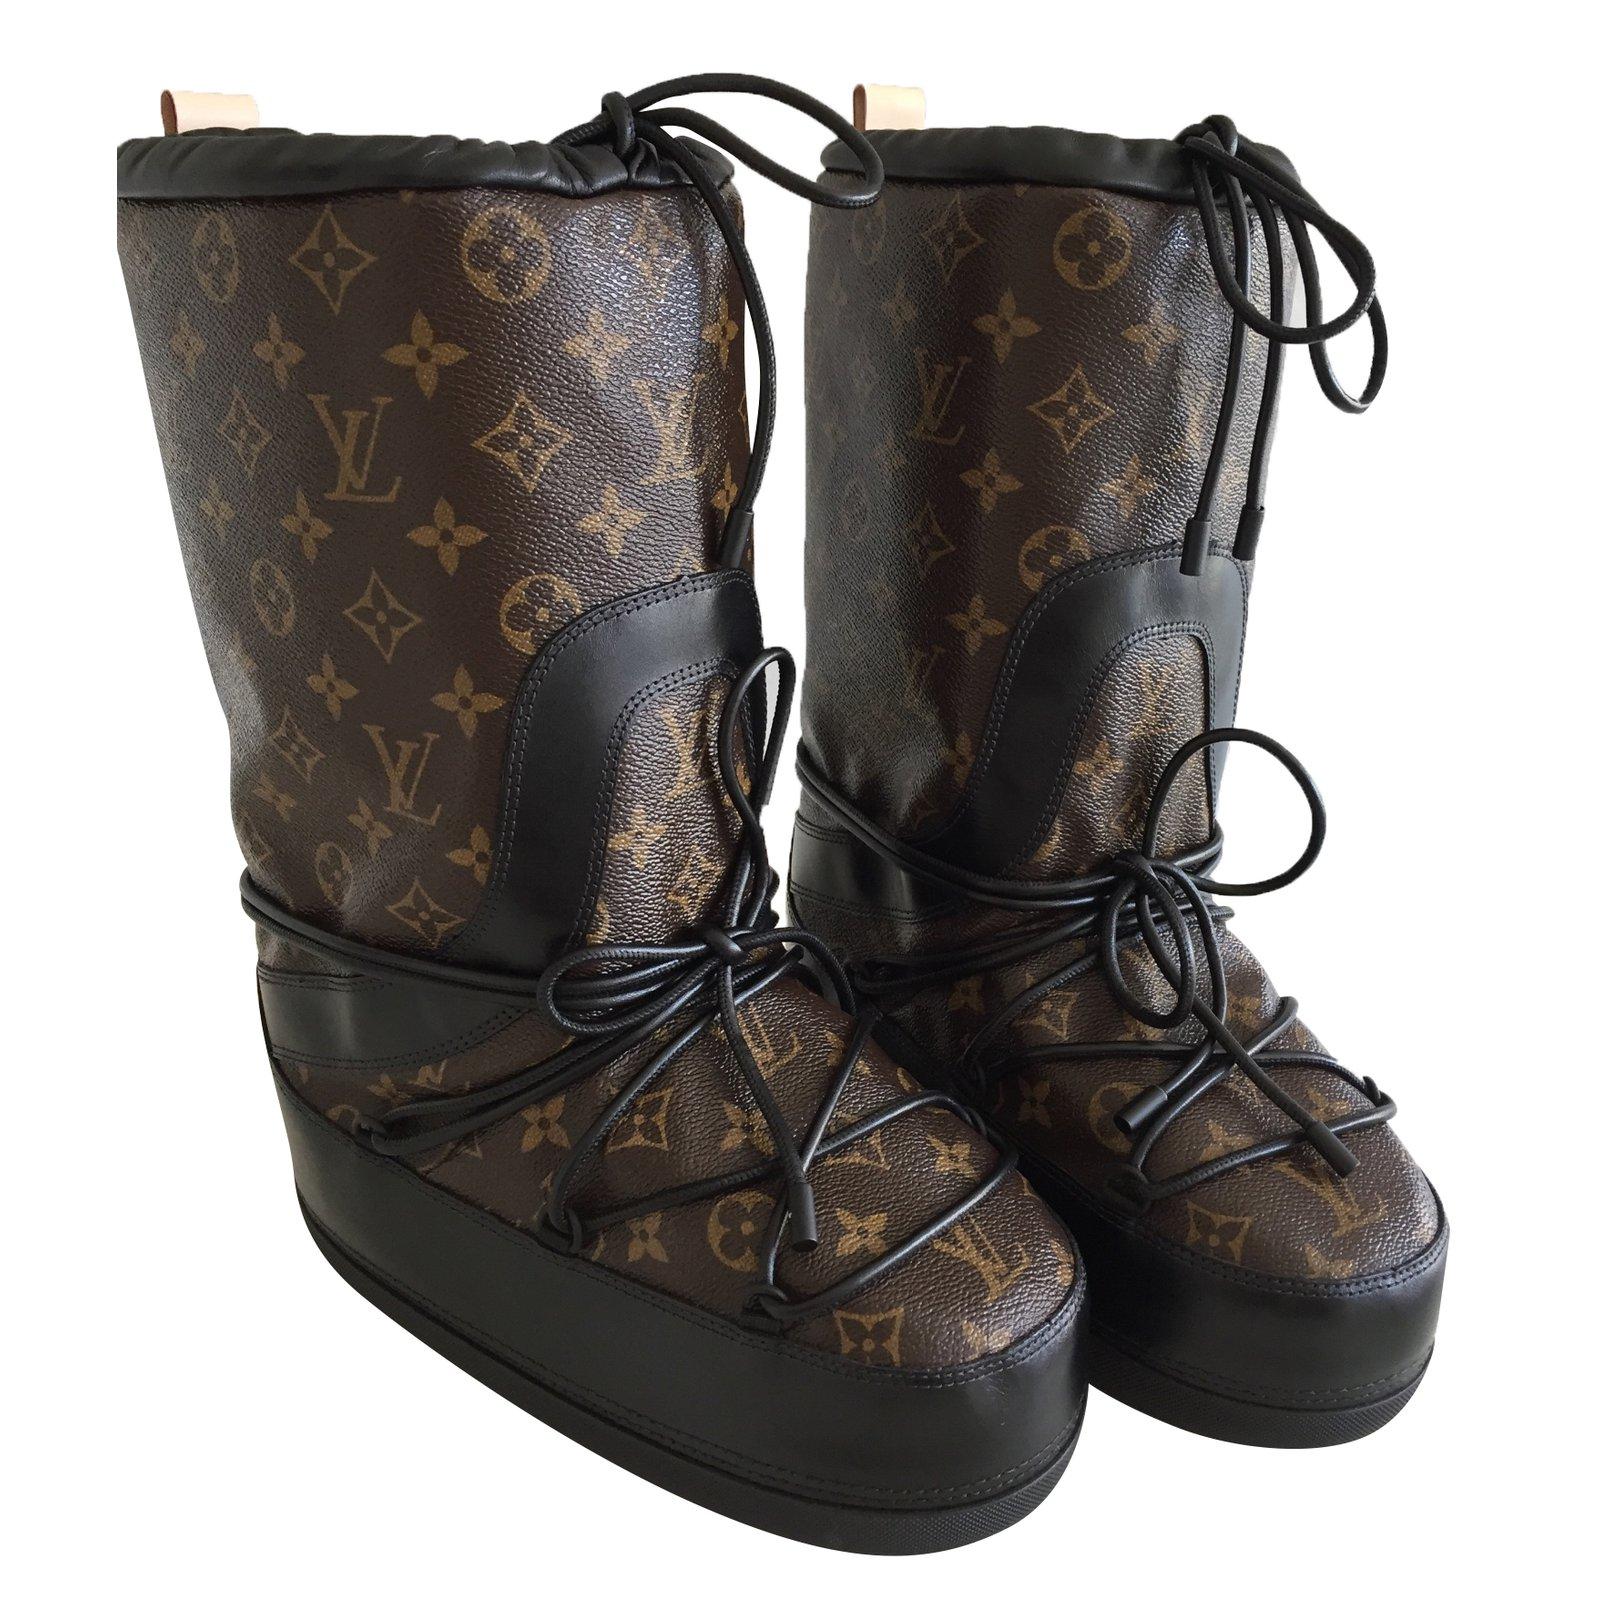 Louis Vuitton Snow day boots Boots Fur